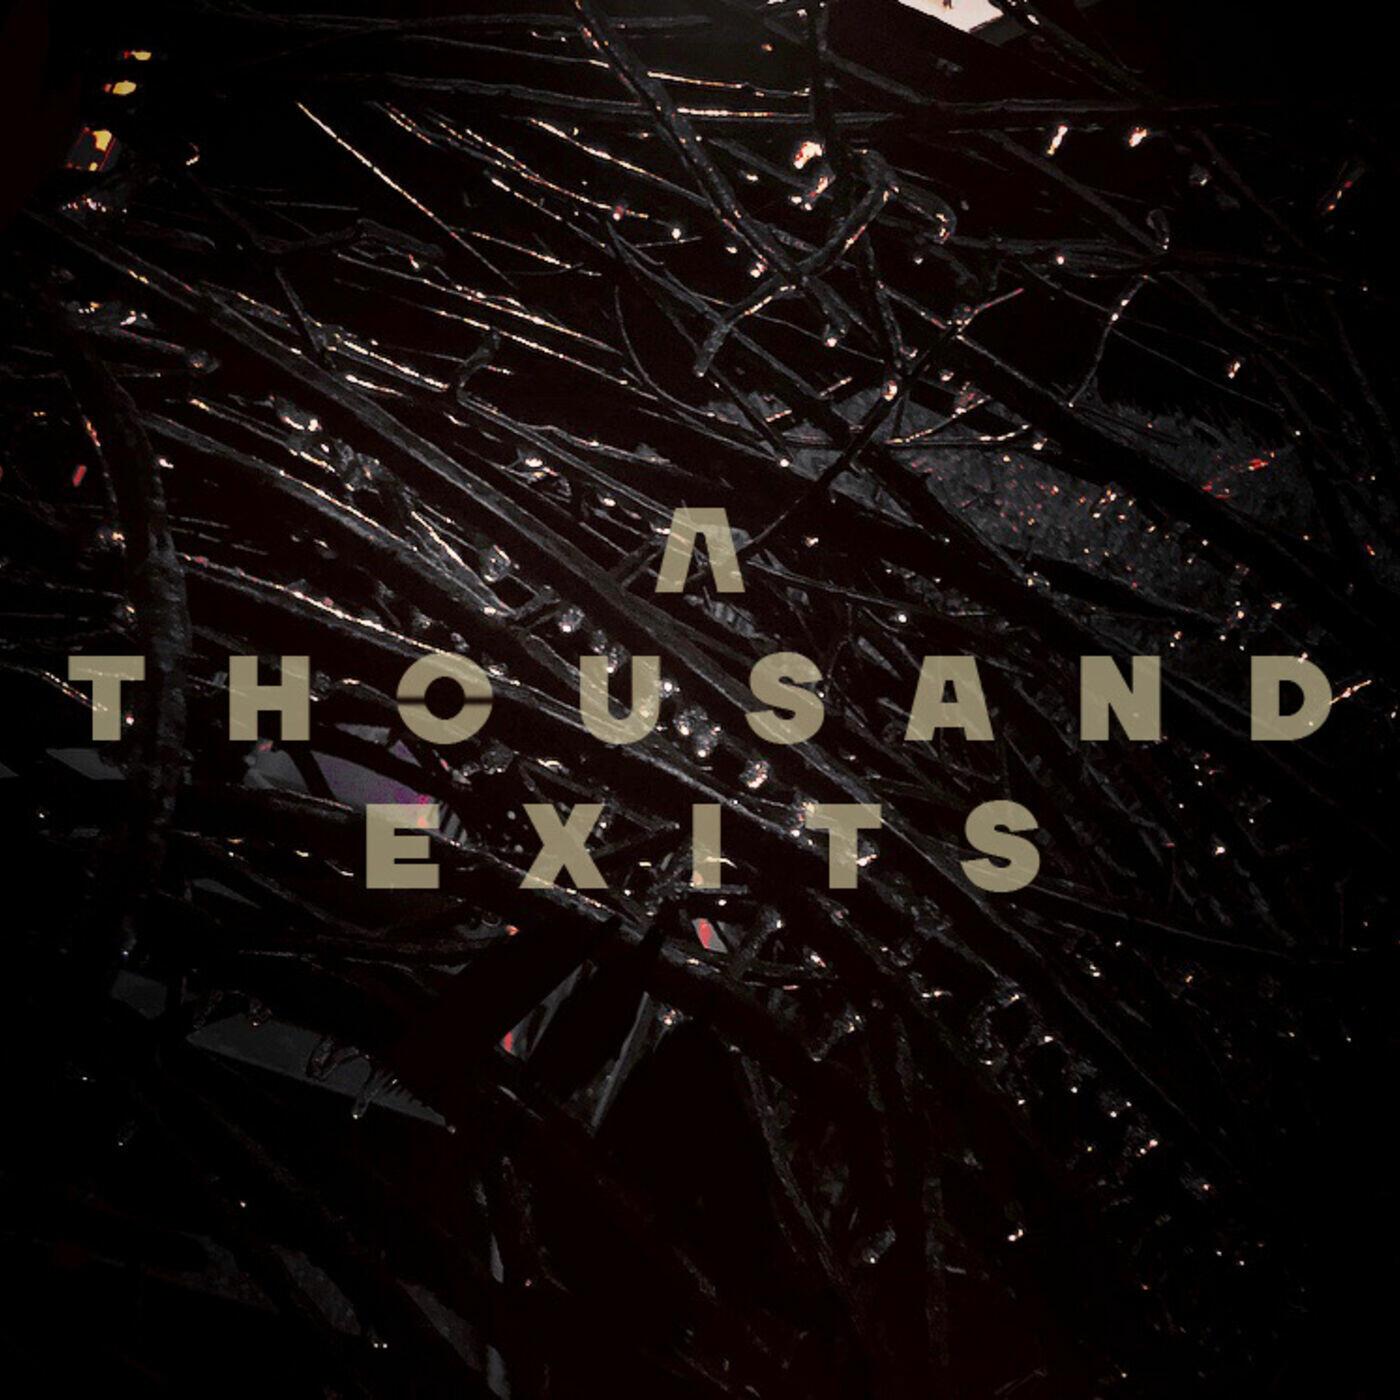 A Thousand Exits